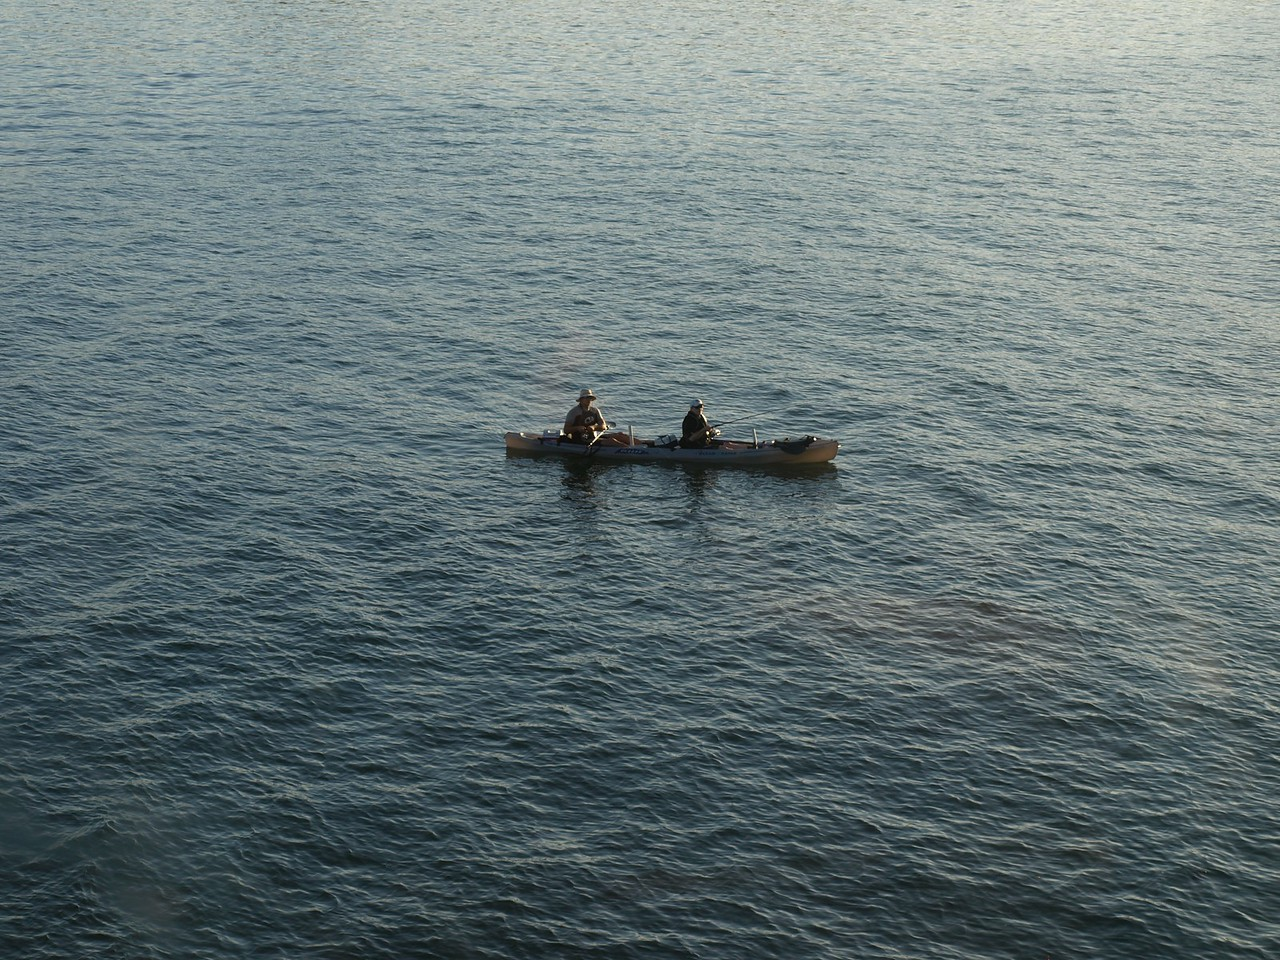 Fisherman in a boat.